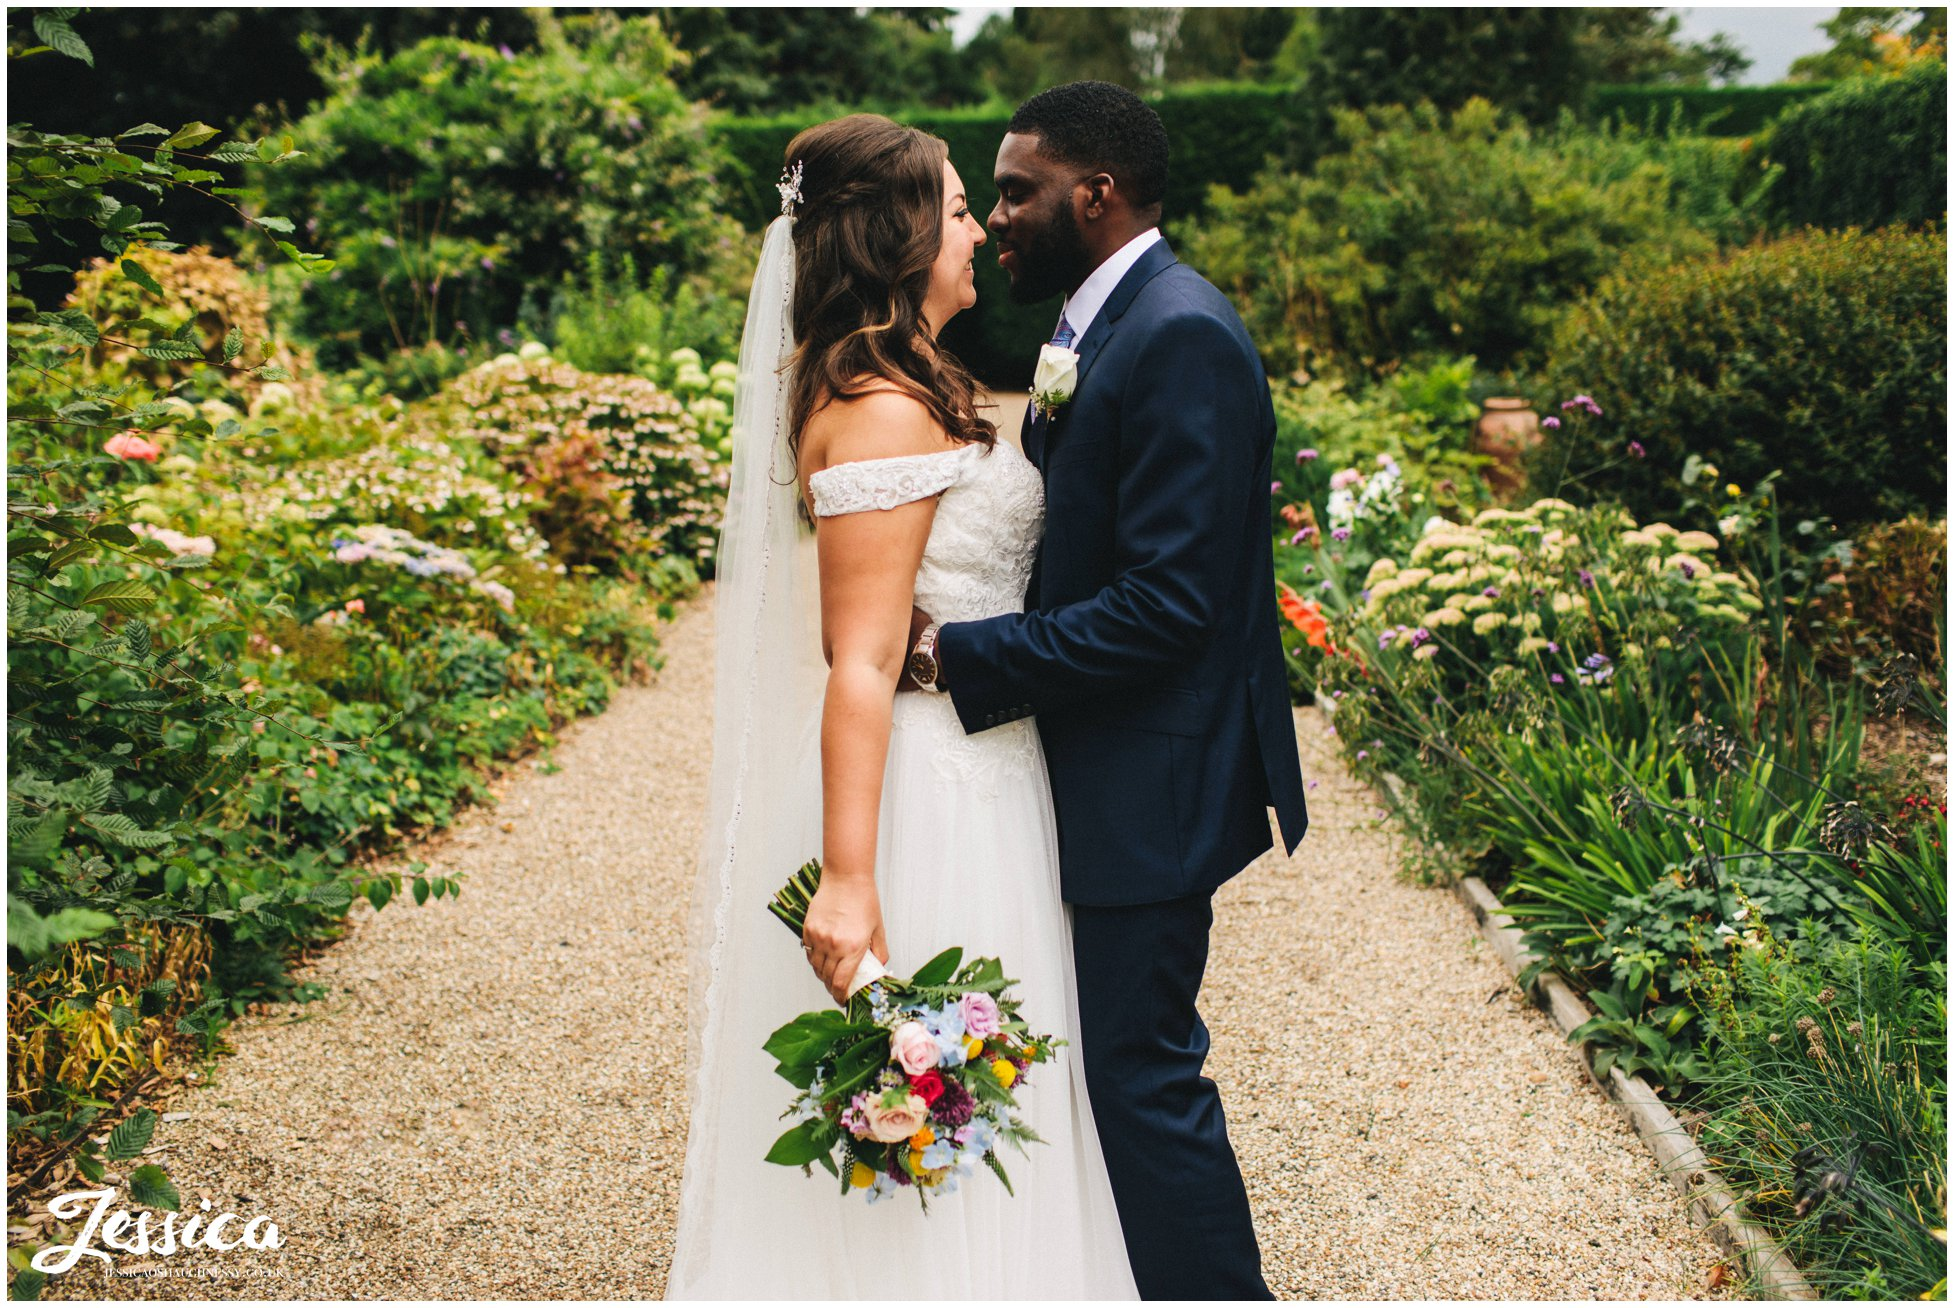 Gaynes Park Wedding in Epping, London